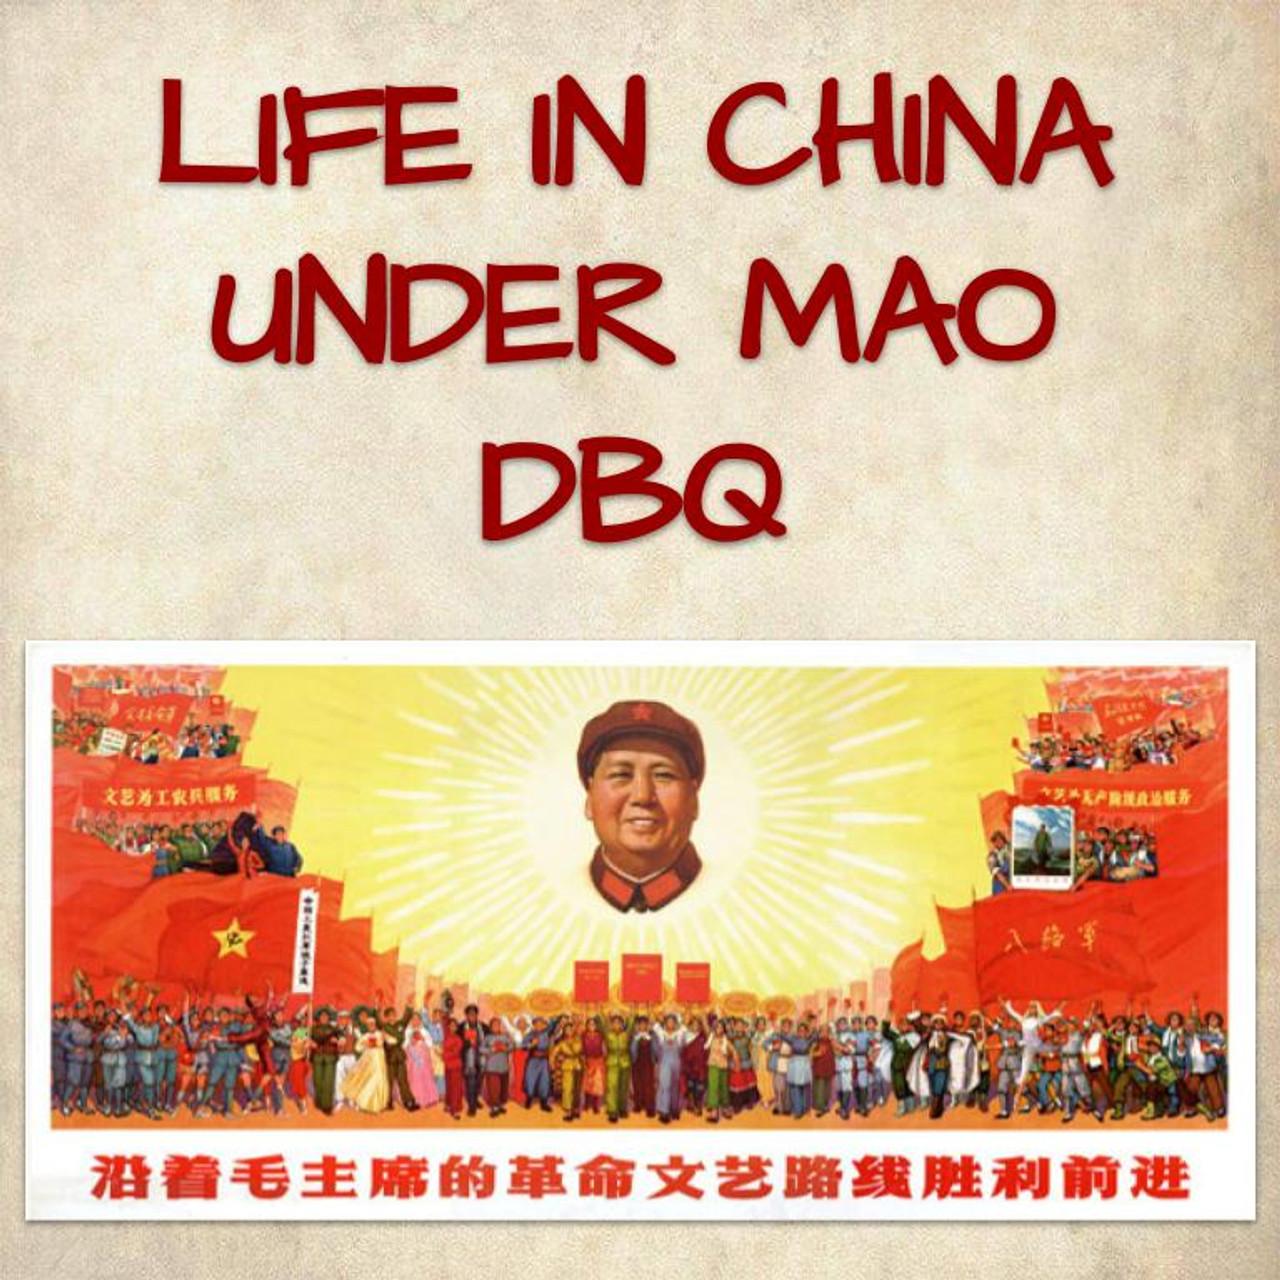 Life in China Under Mao DBQ